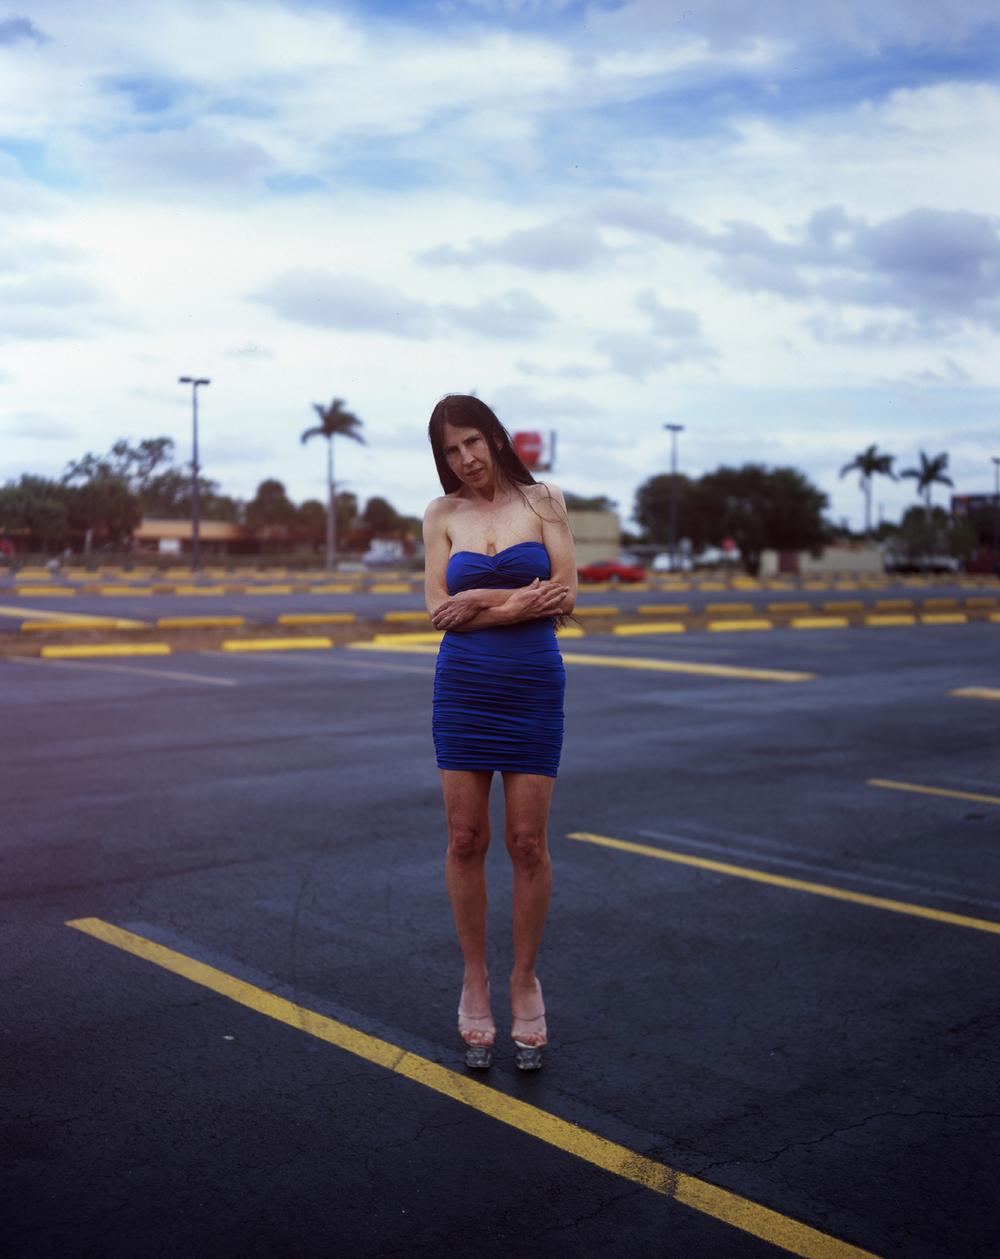 03 Geraldine, casino parking lot.jpg